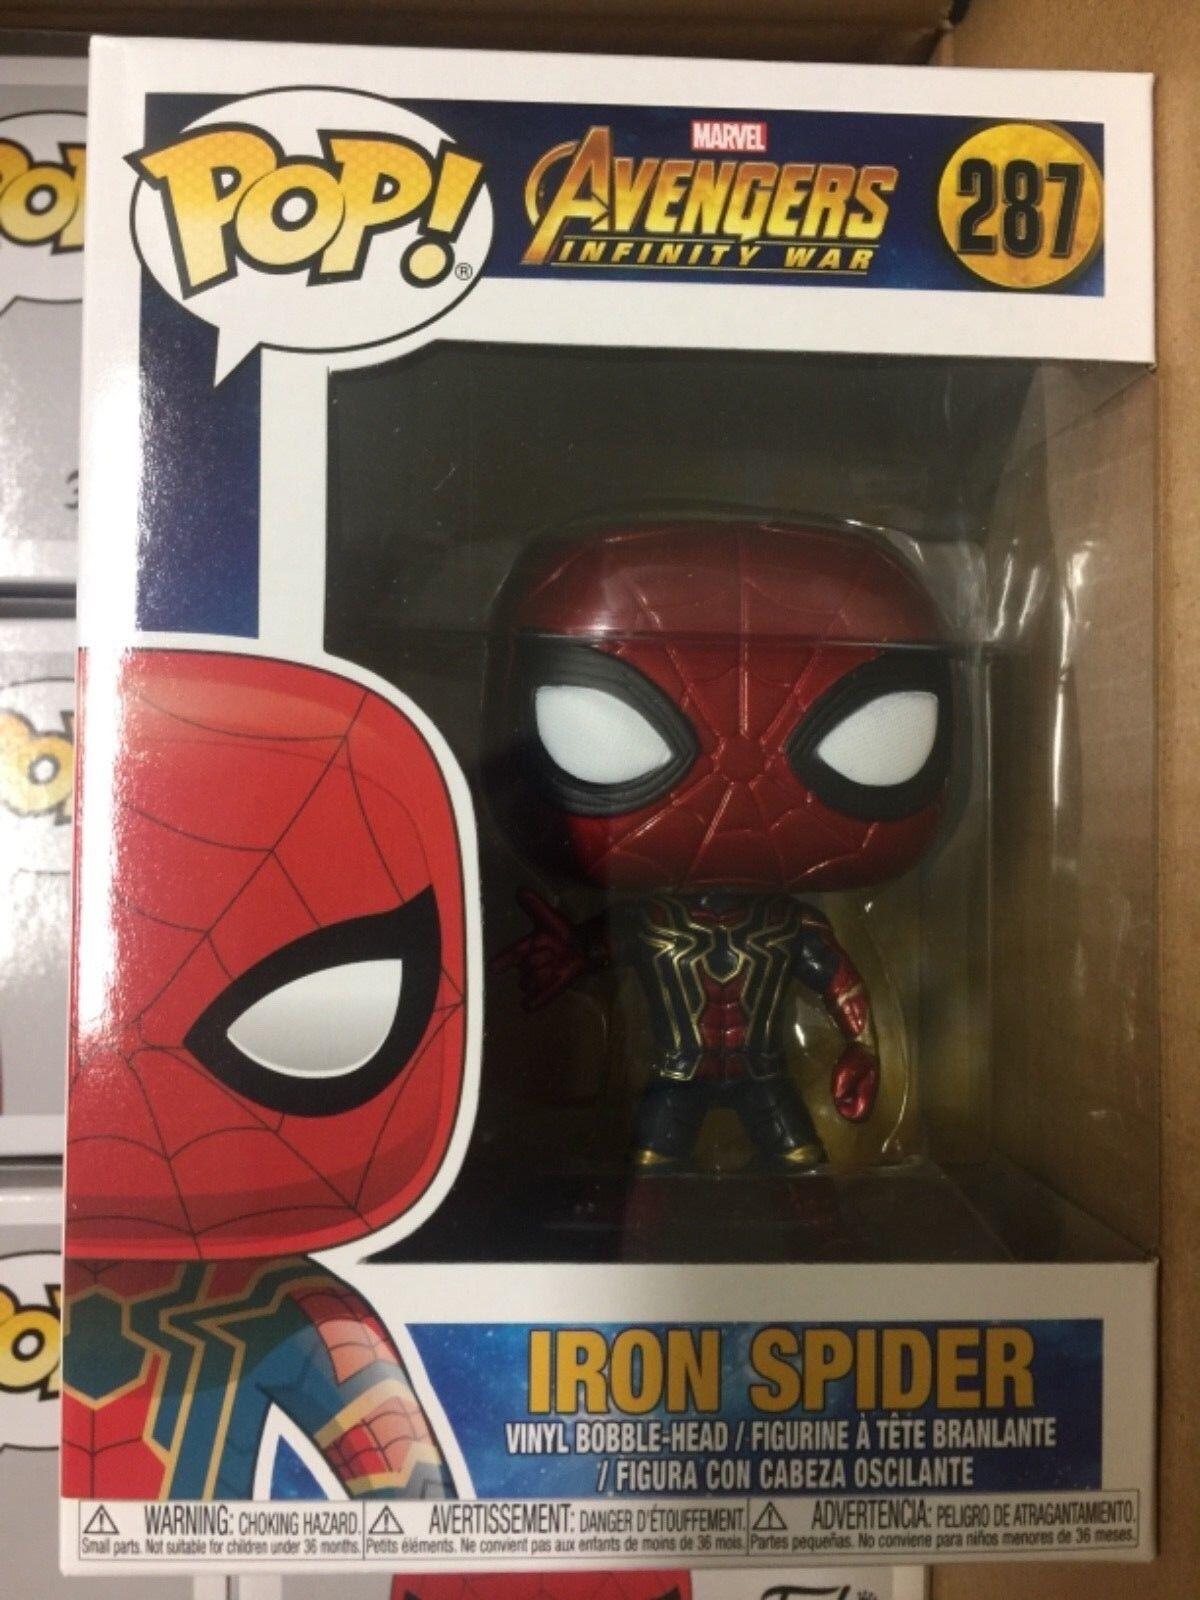 AVENGERS infinity war 26465 Pop Bobble Marvel Iron Spider figurine